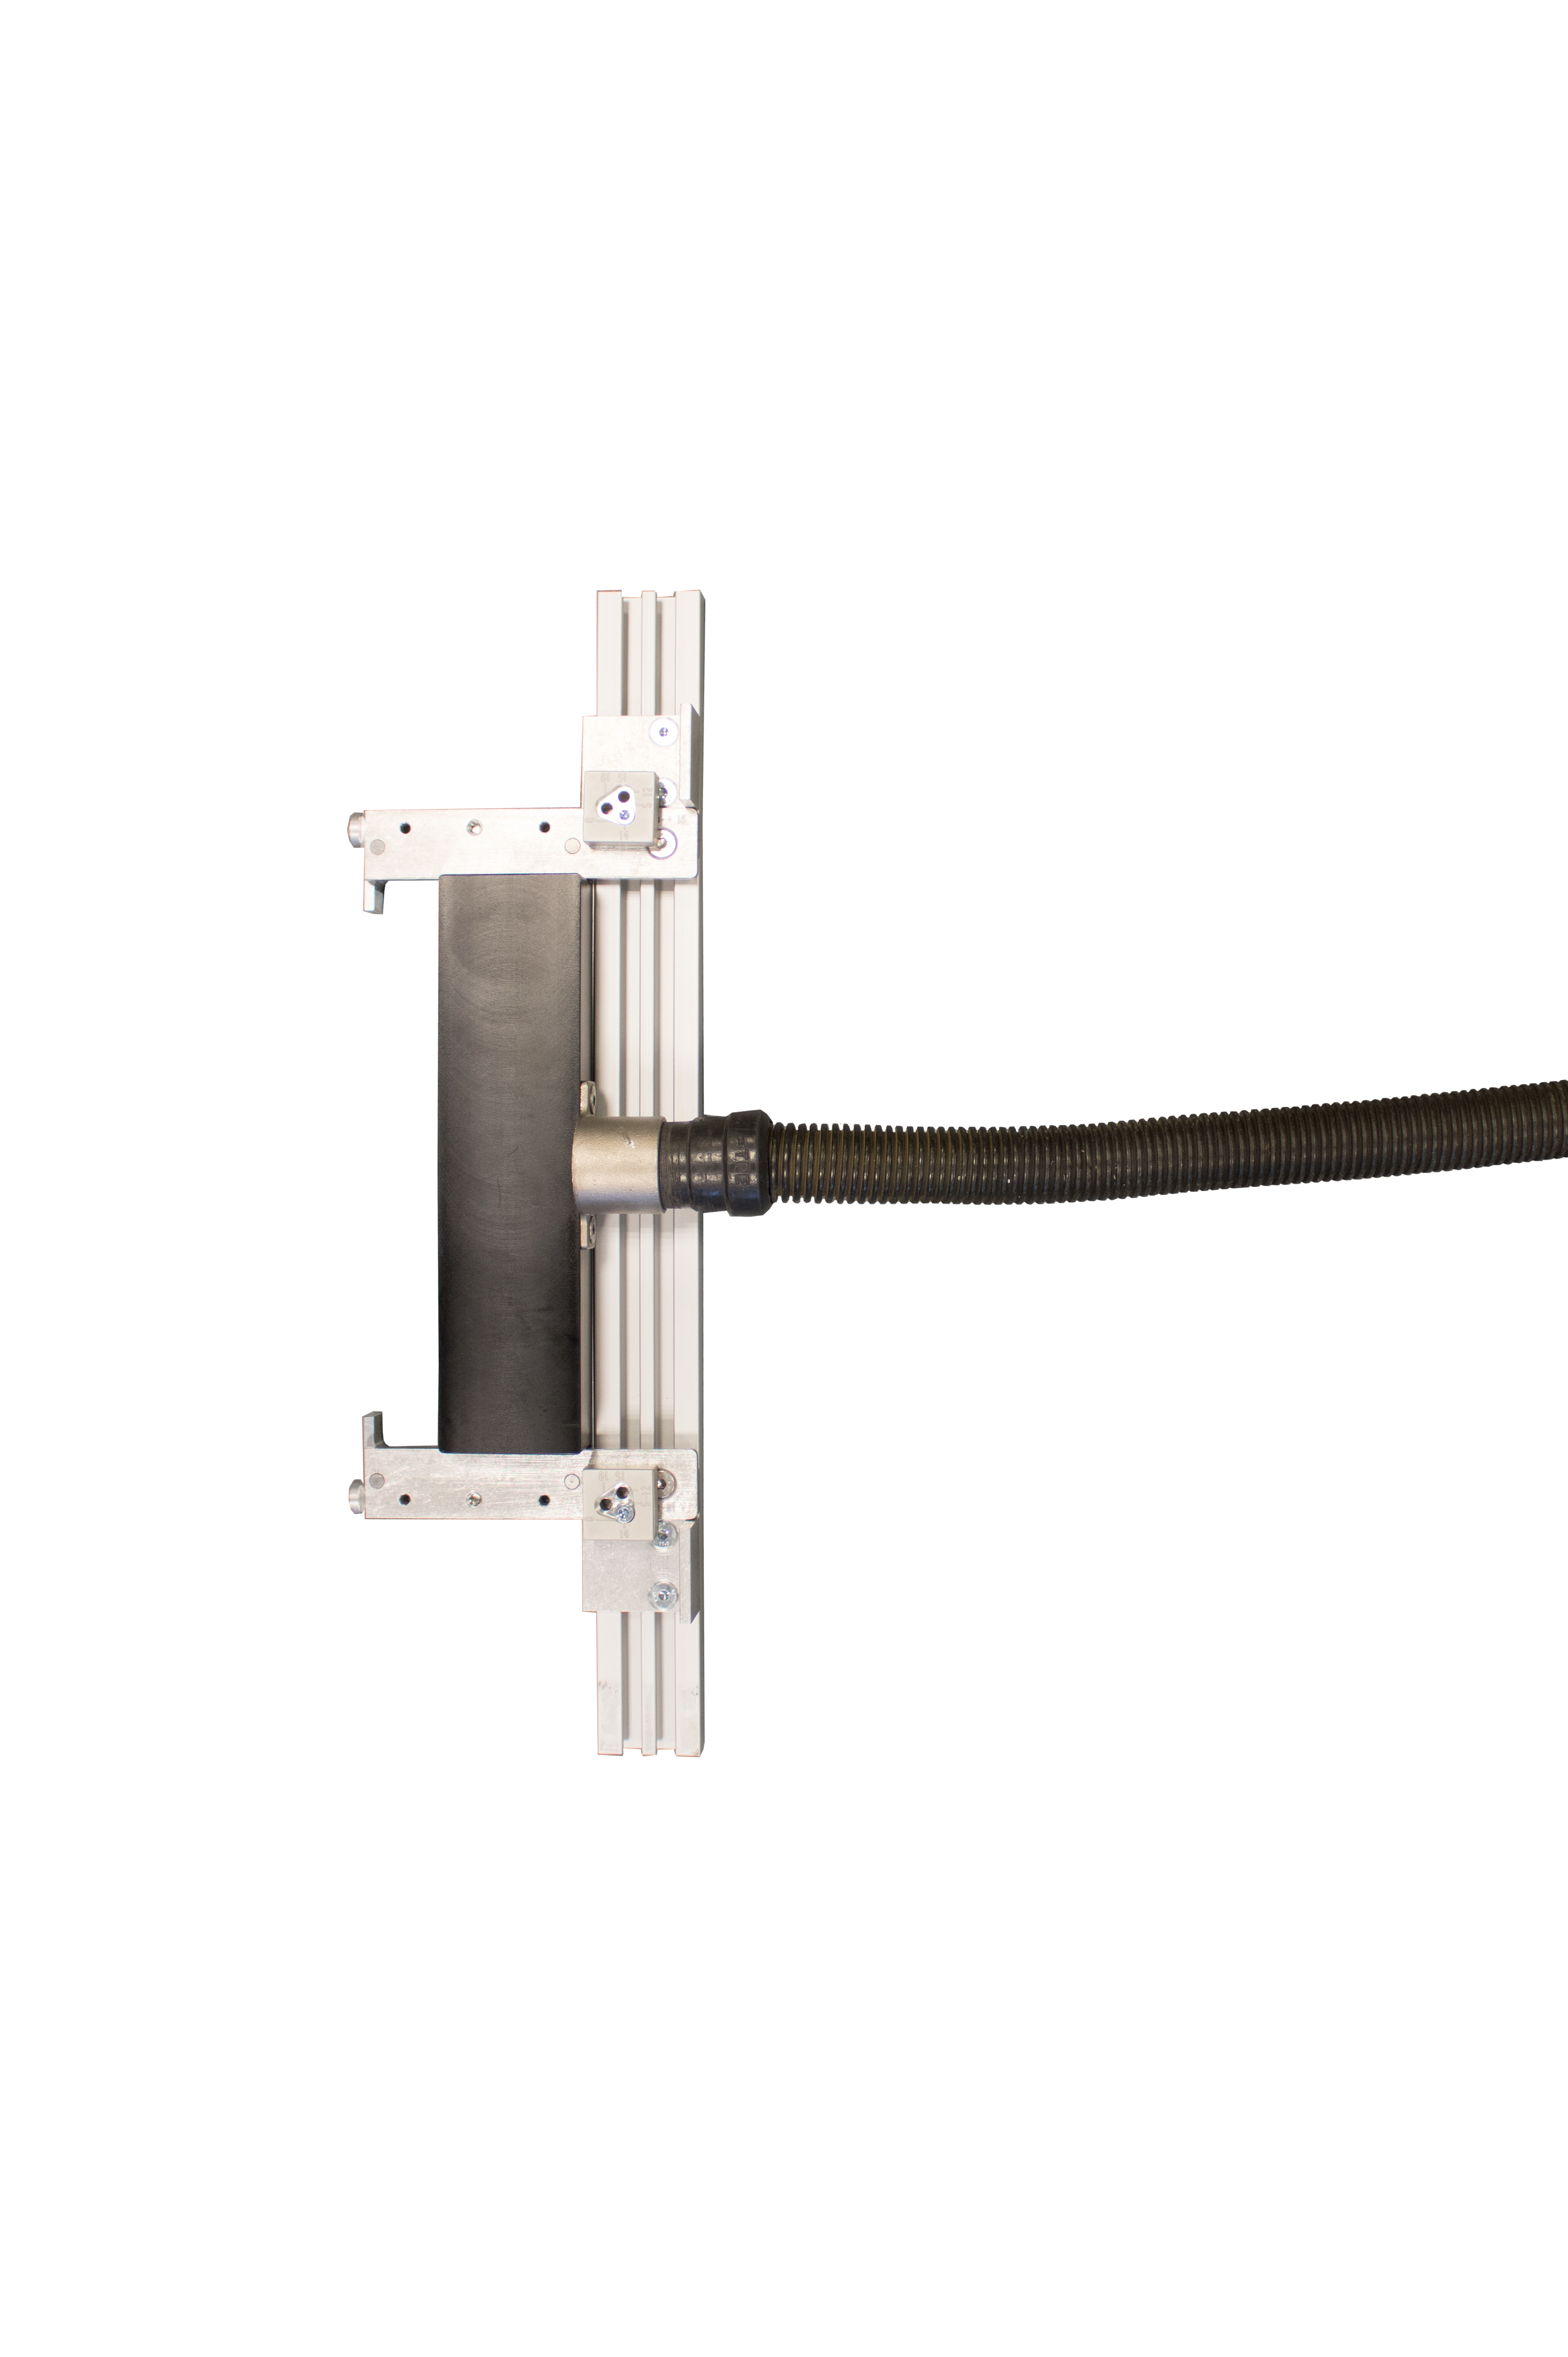 Basismal rails incl. 1 basisbl. en stofafz. 300mm